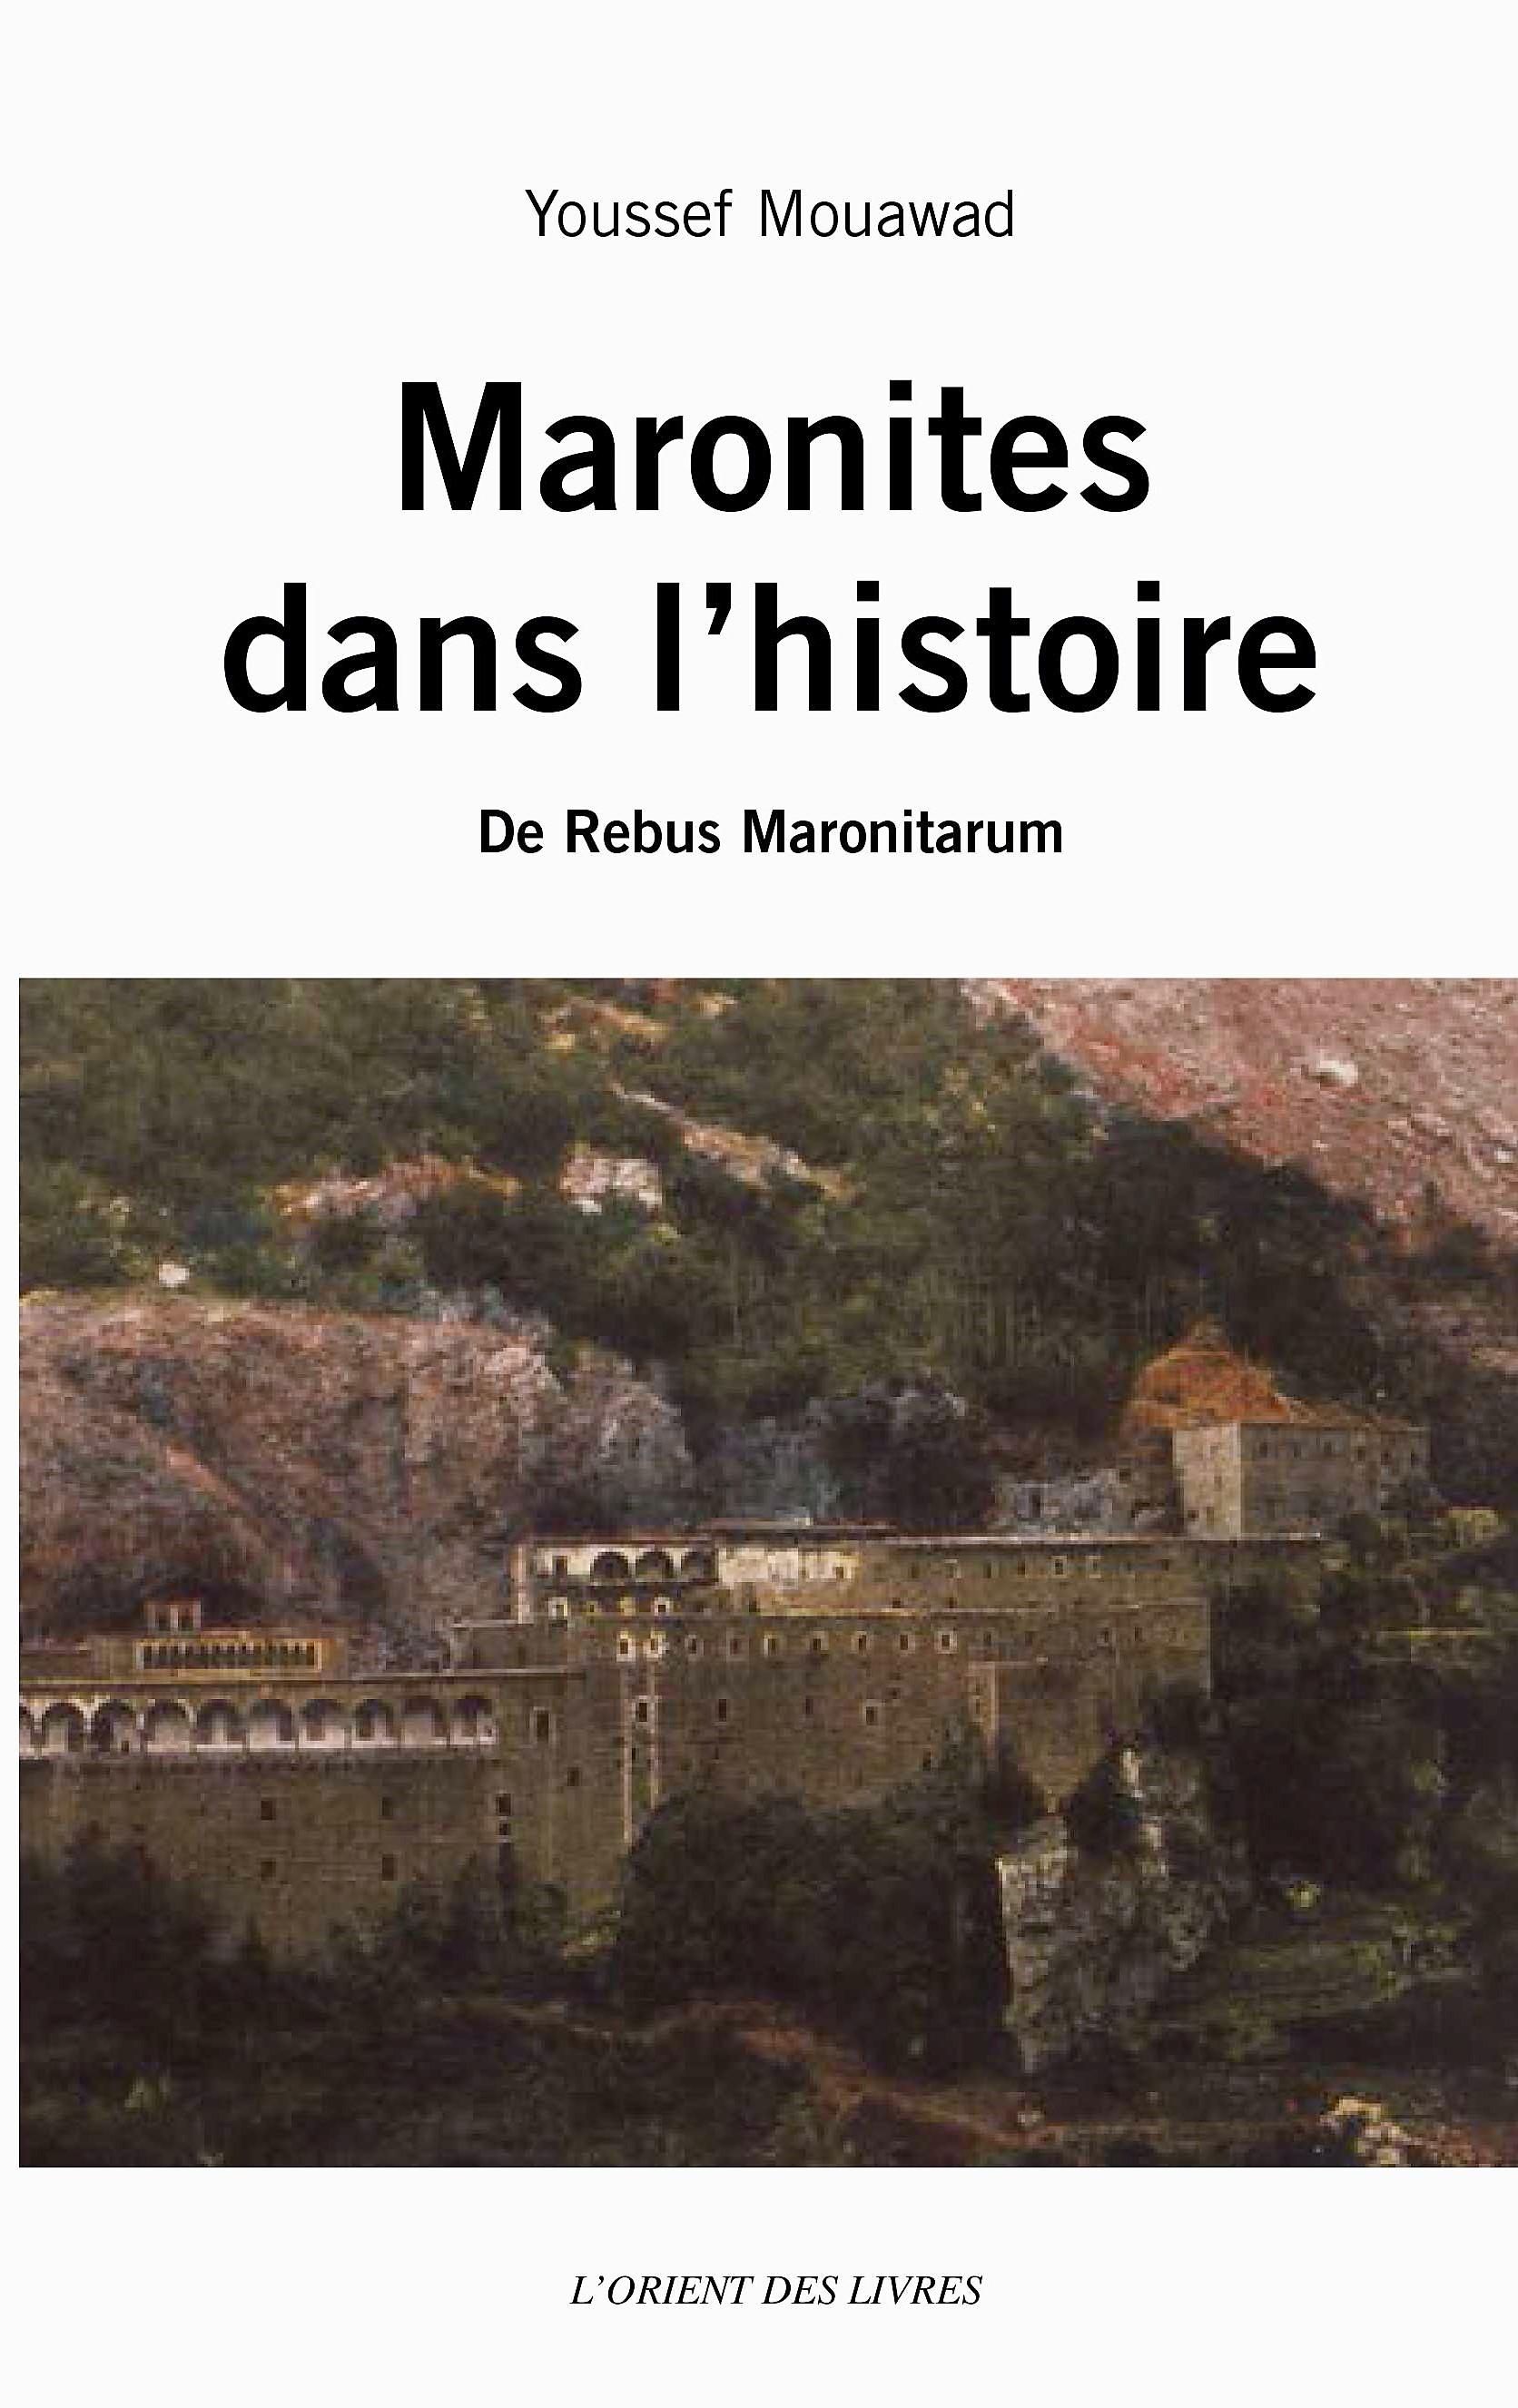 MARONITES DANS L'HISTOIRE